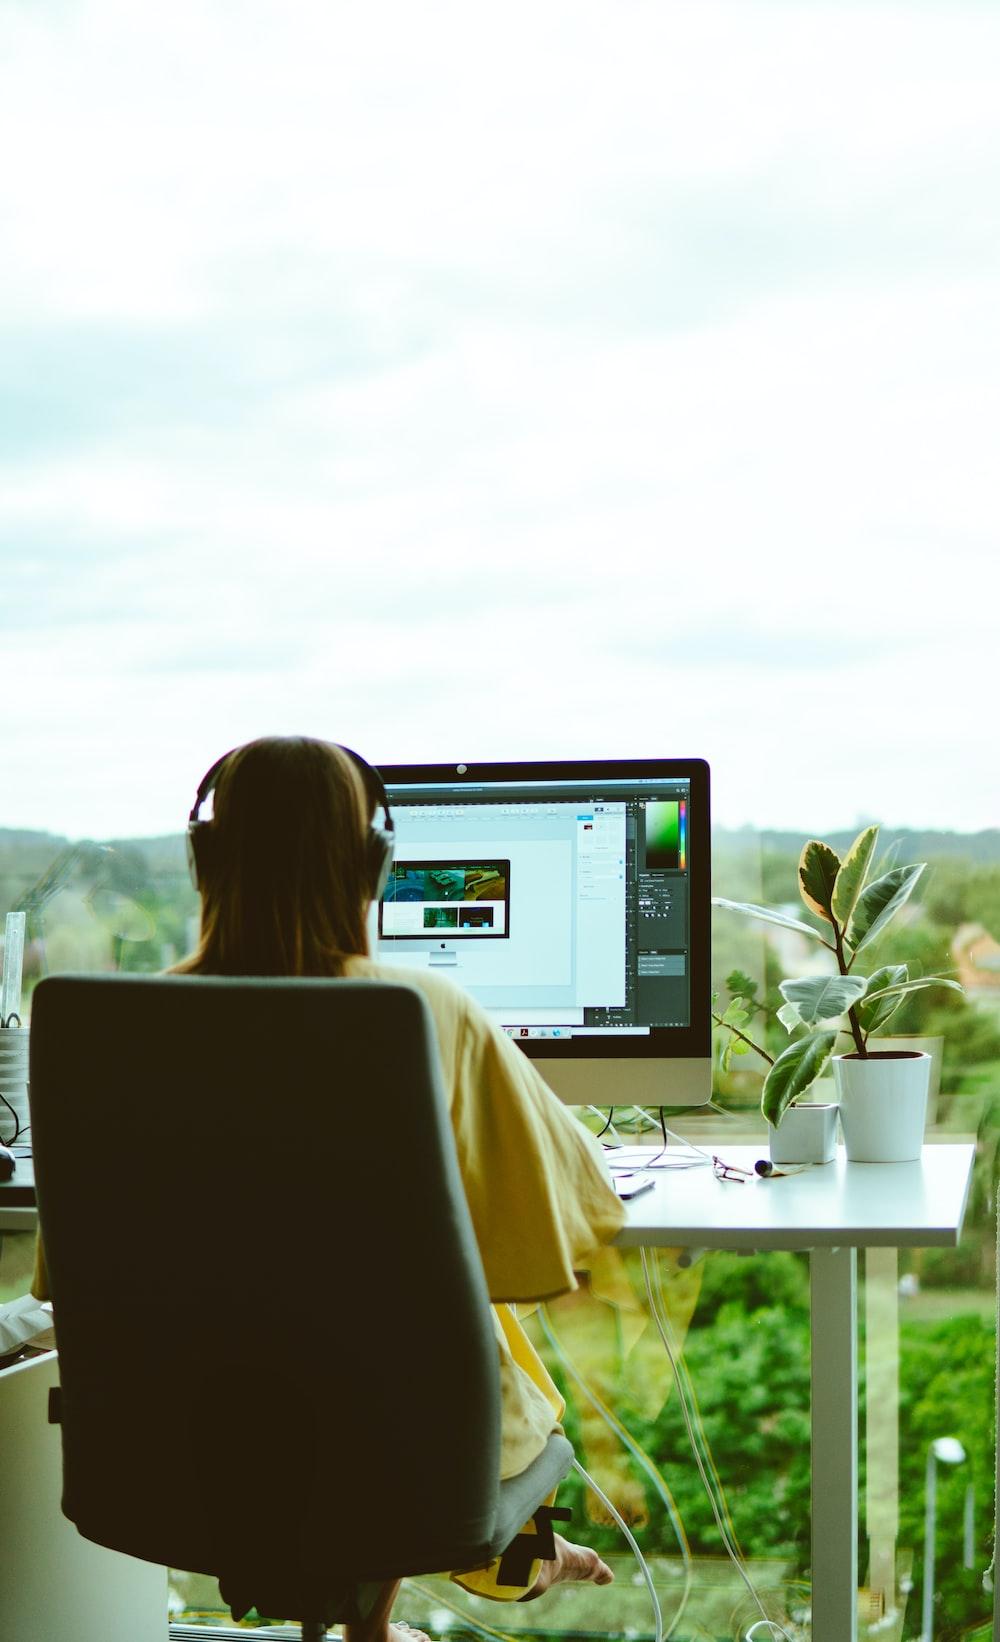 woman wearing yellow blouse using computer